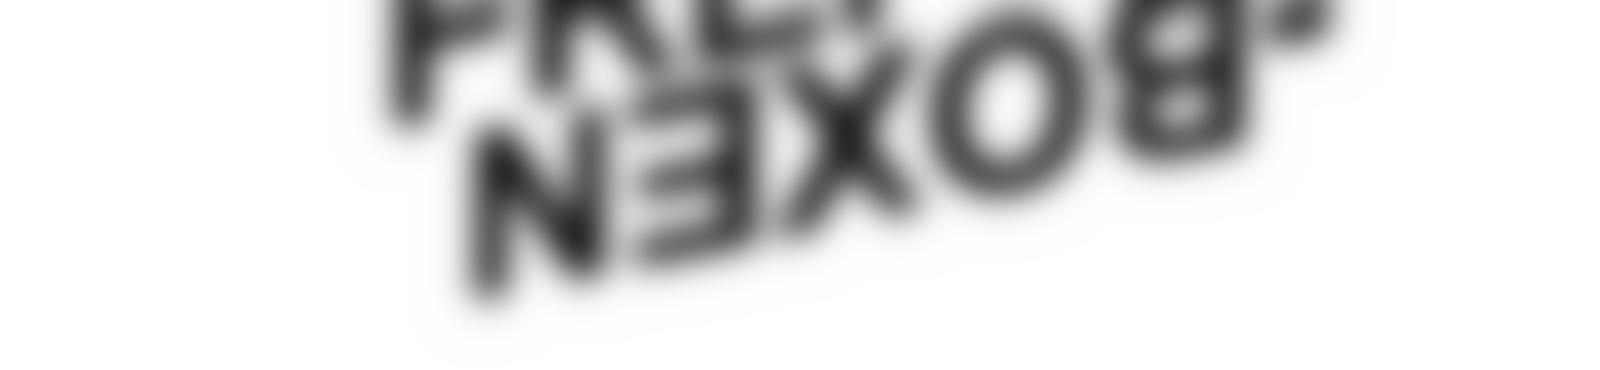 Blurred 77f2699e 018a 4bd6 a570 5044c005ef8d